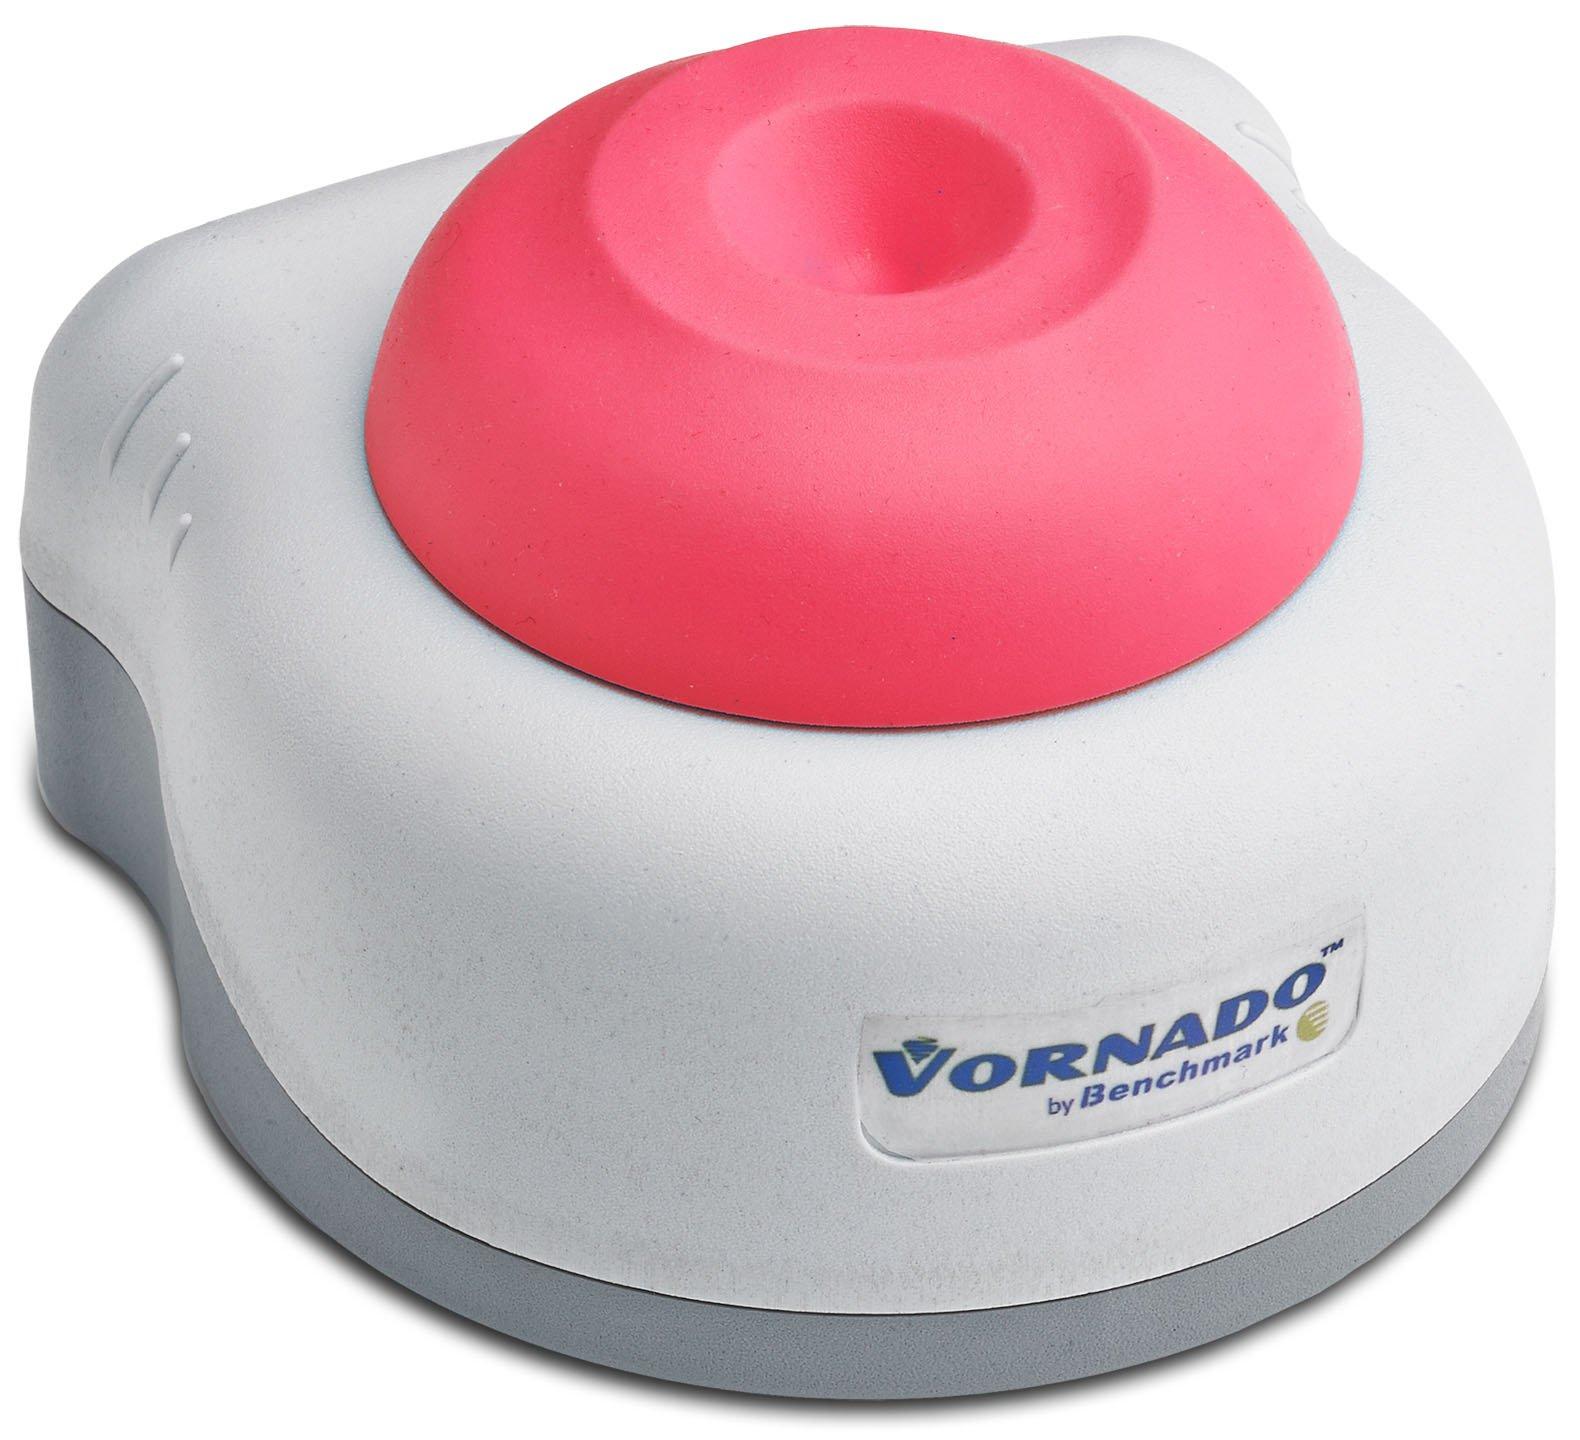 Vornado Miniature Vortexer Mixer - Red Cup Head